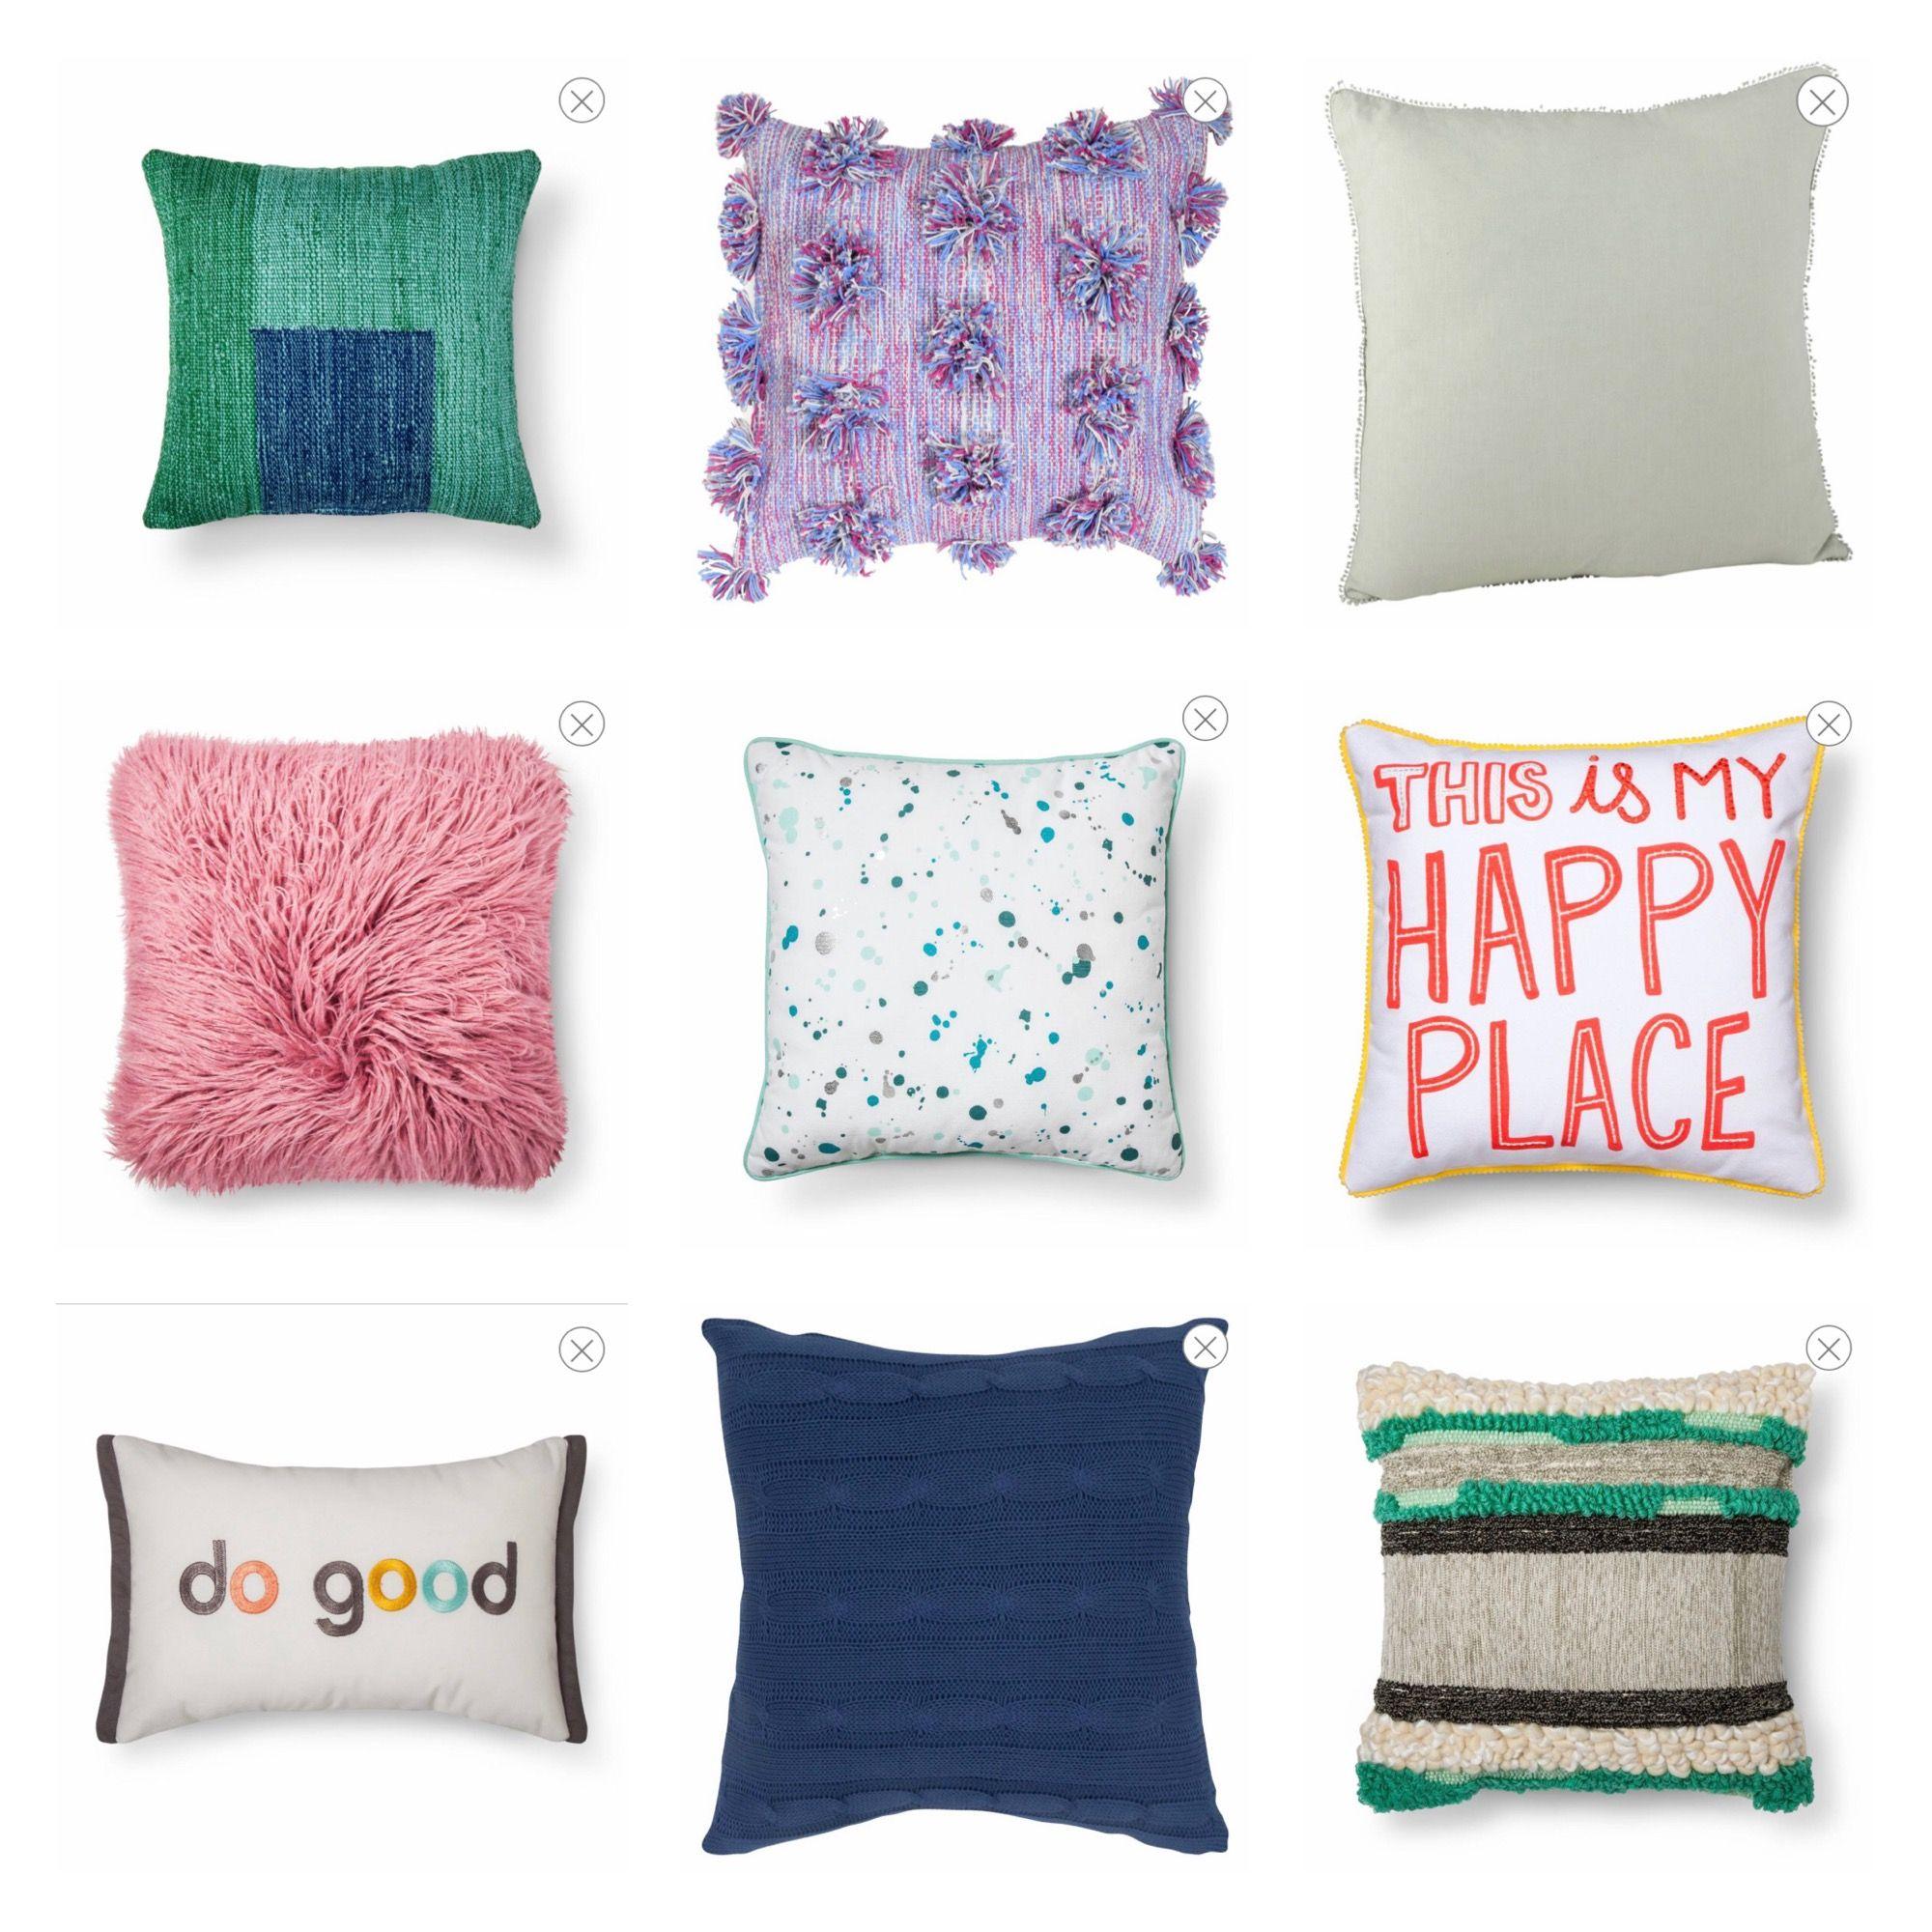 Throw pillows upstairs playroom pinterest playrooms throw